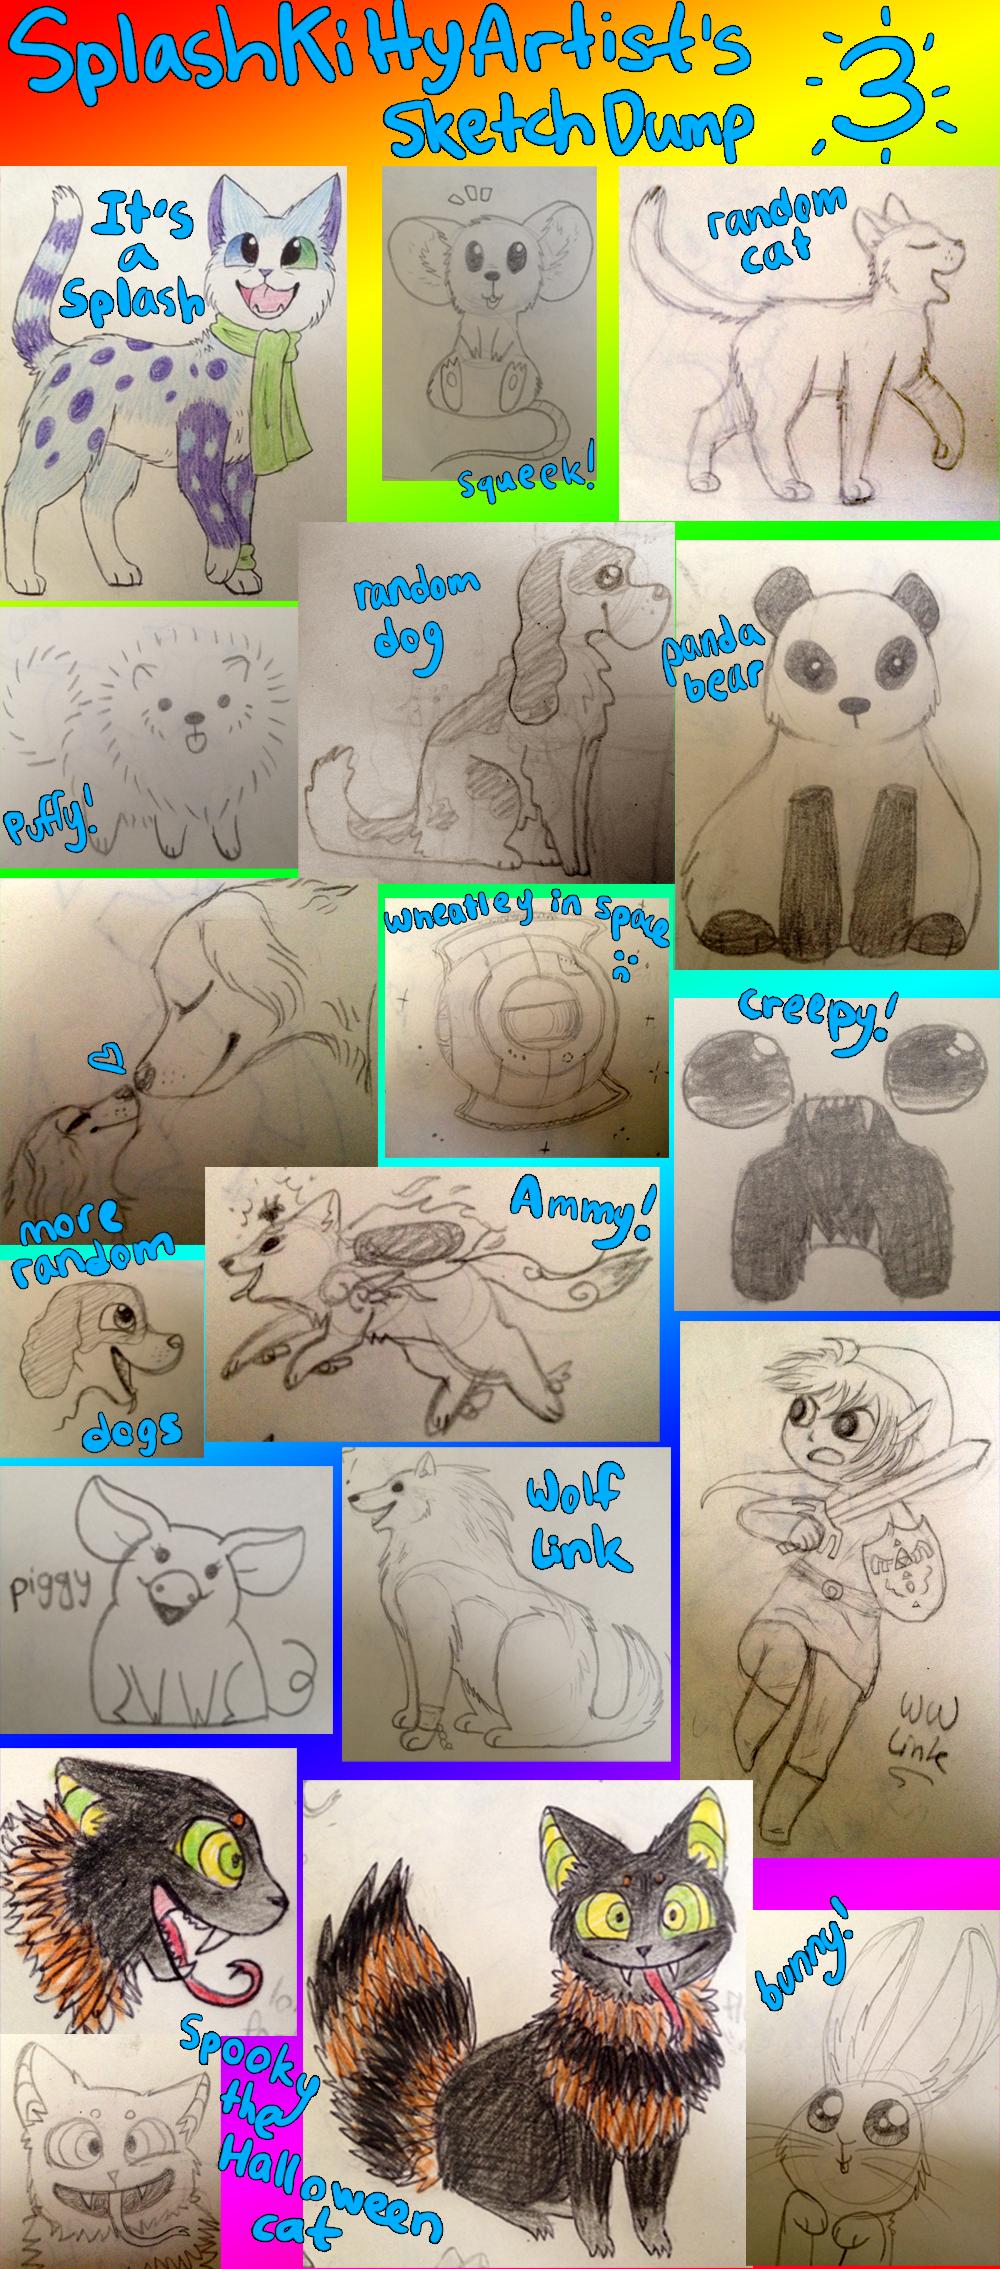 Sketchbook stuff by pSarahdactyls